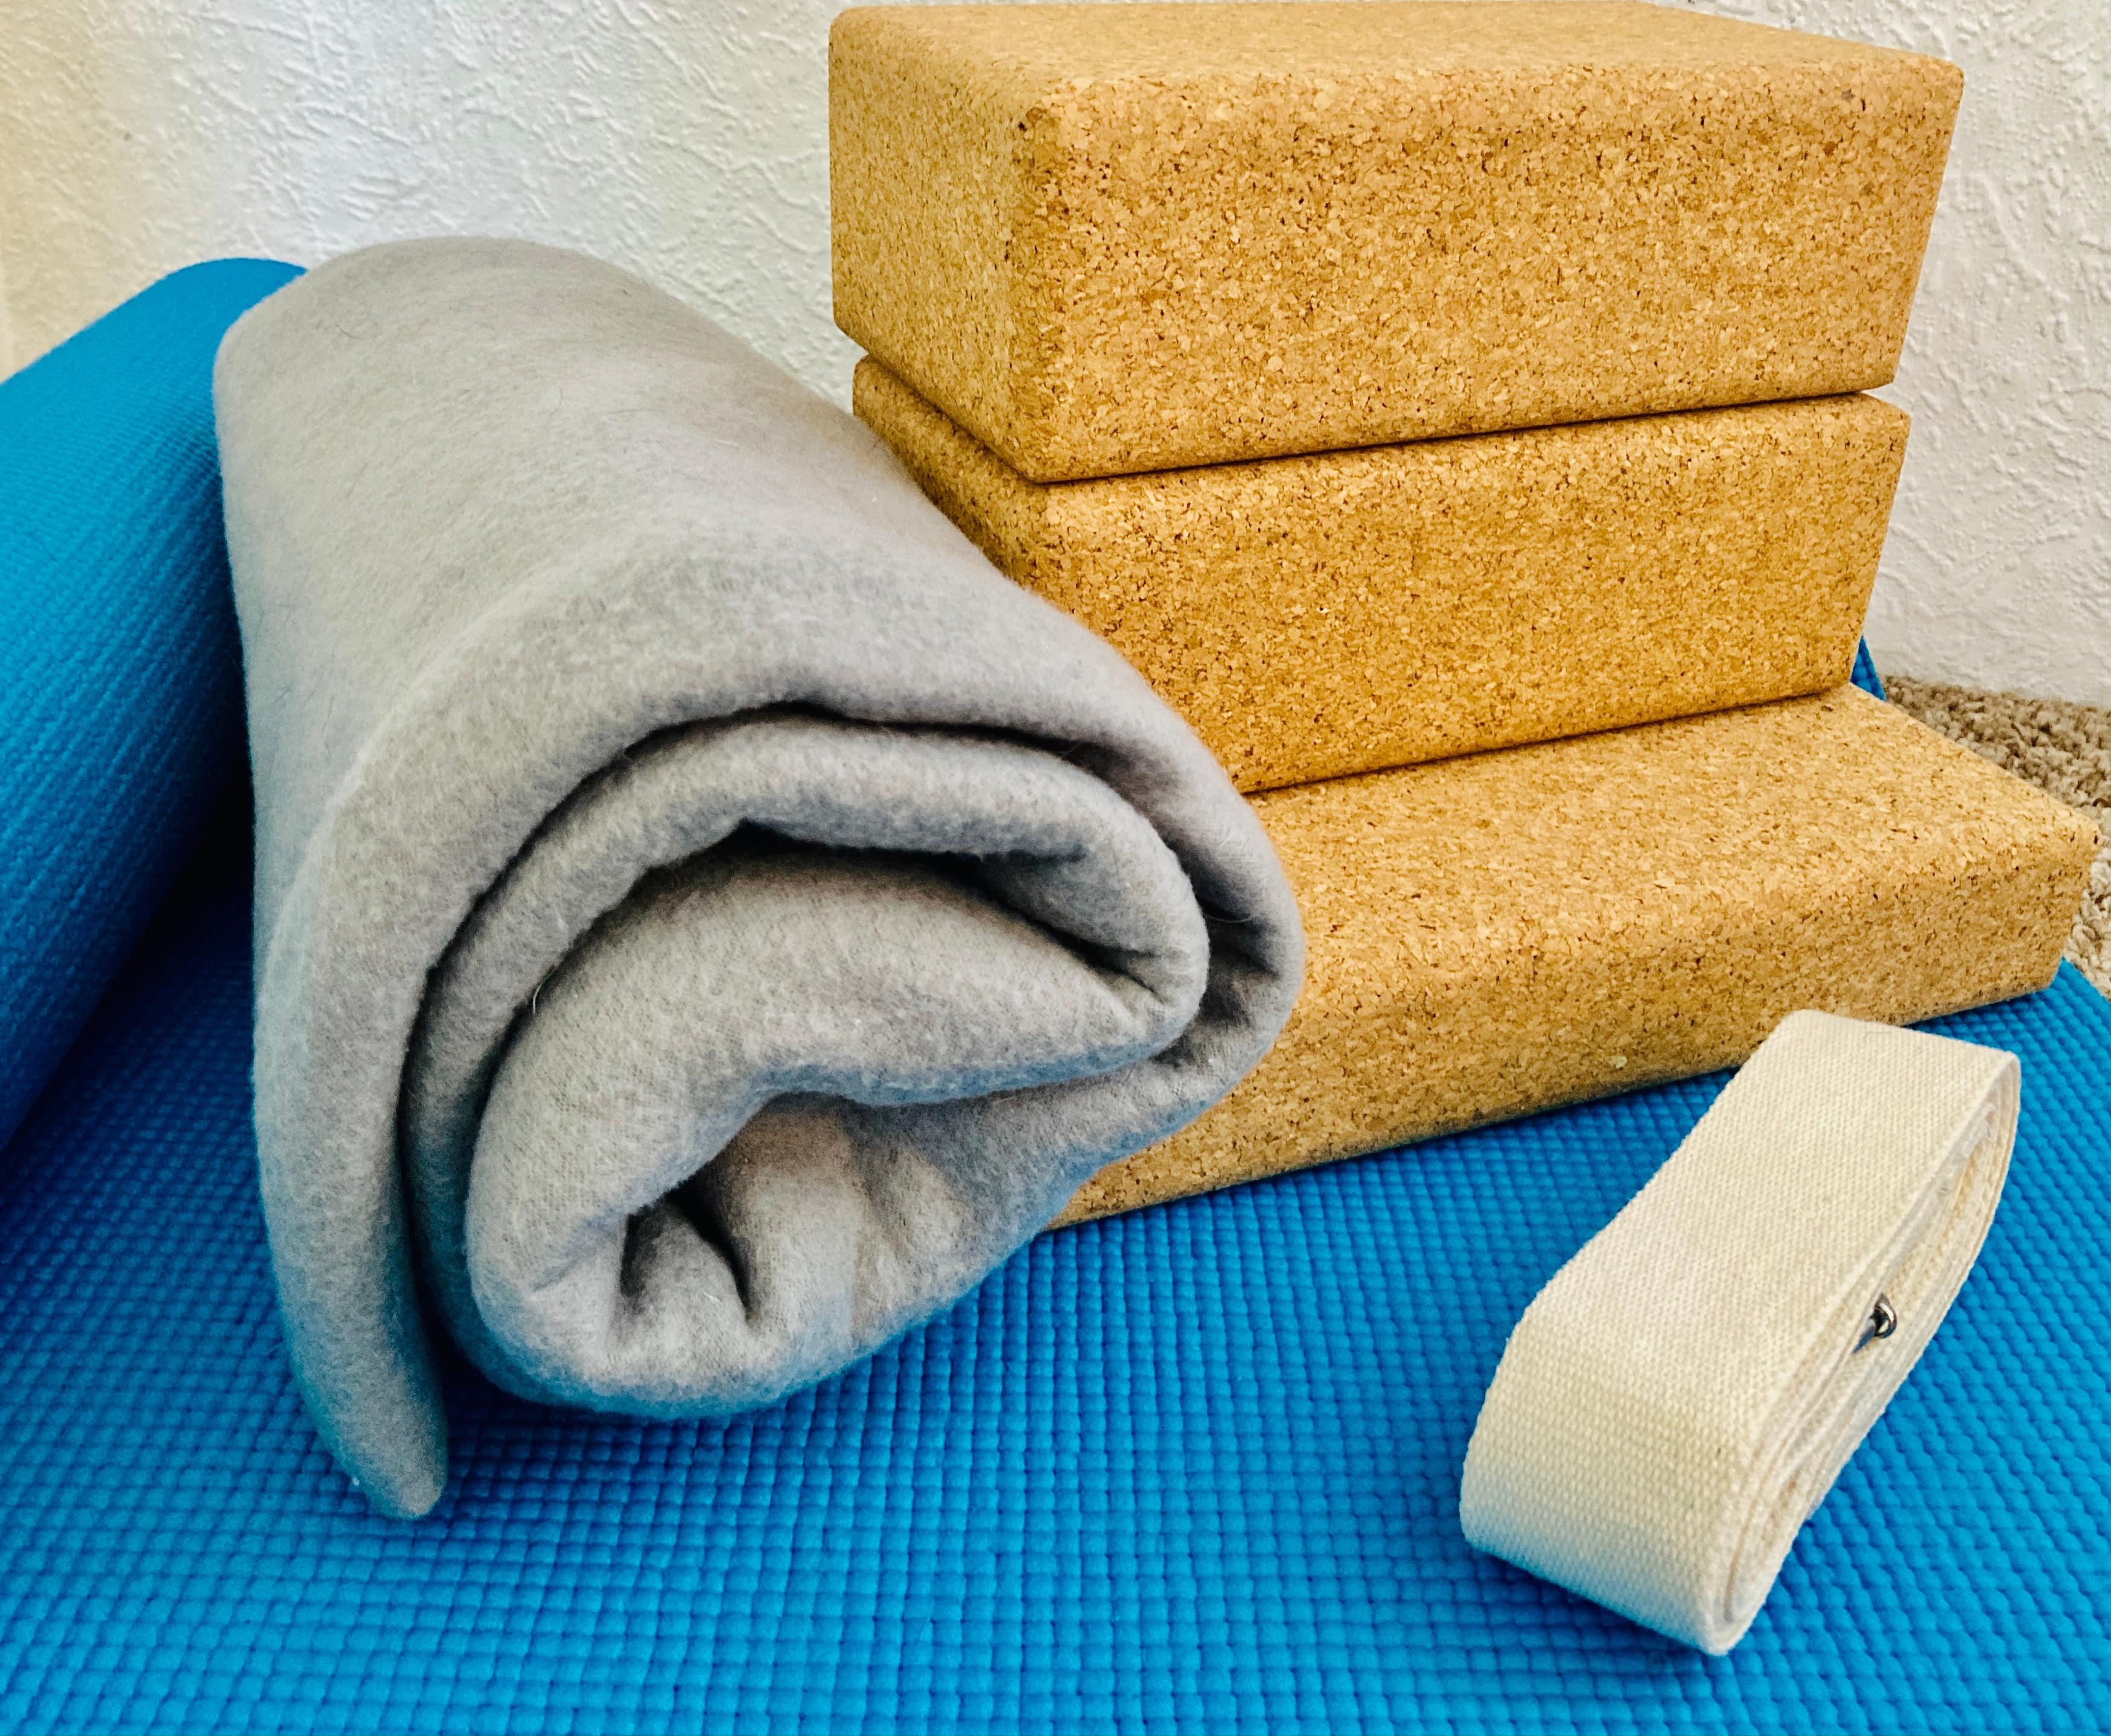 Restorative Yoga and Yoga Nidra